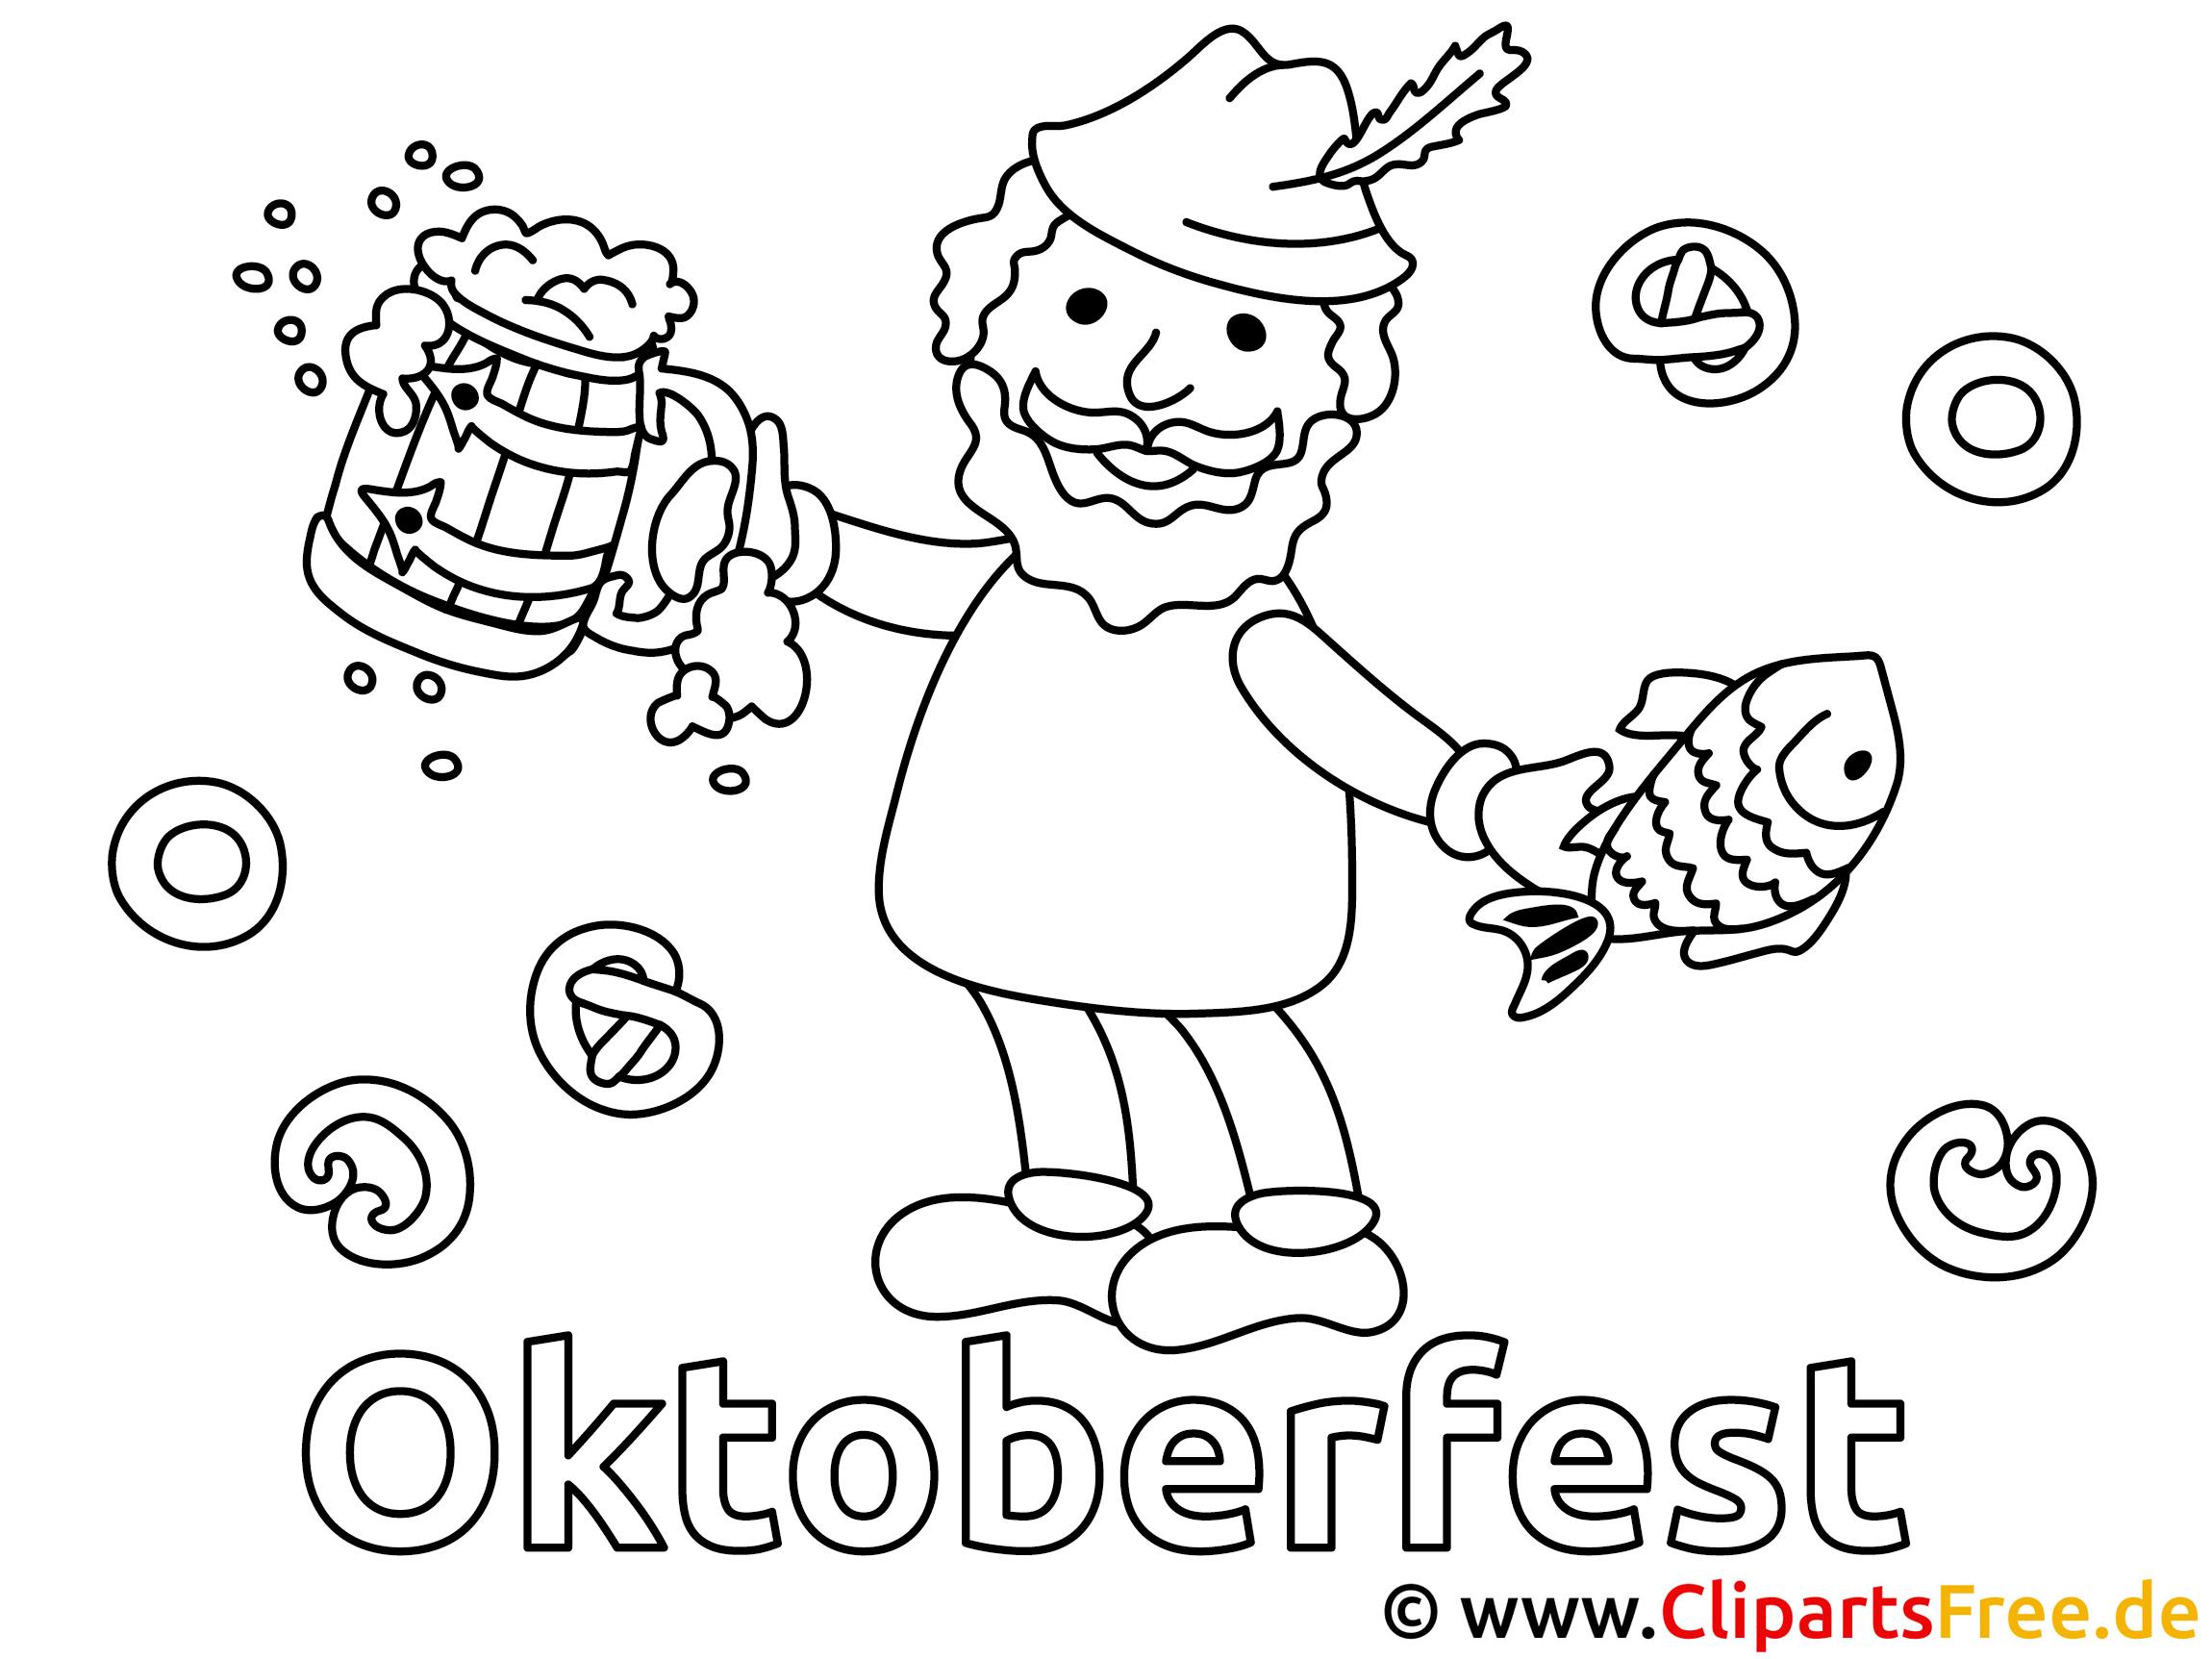 Ausmalbilder zum Oktoberfest